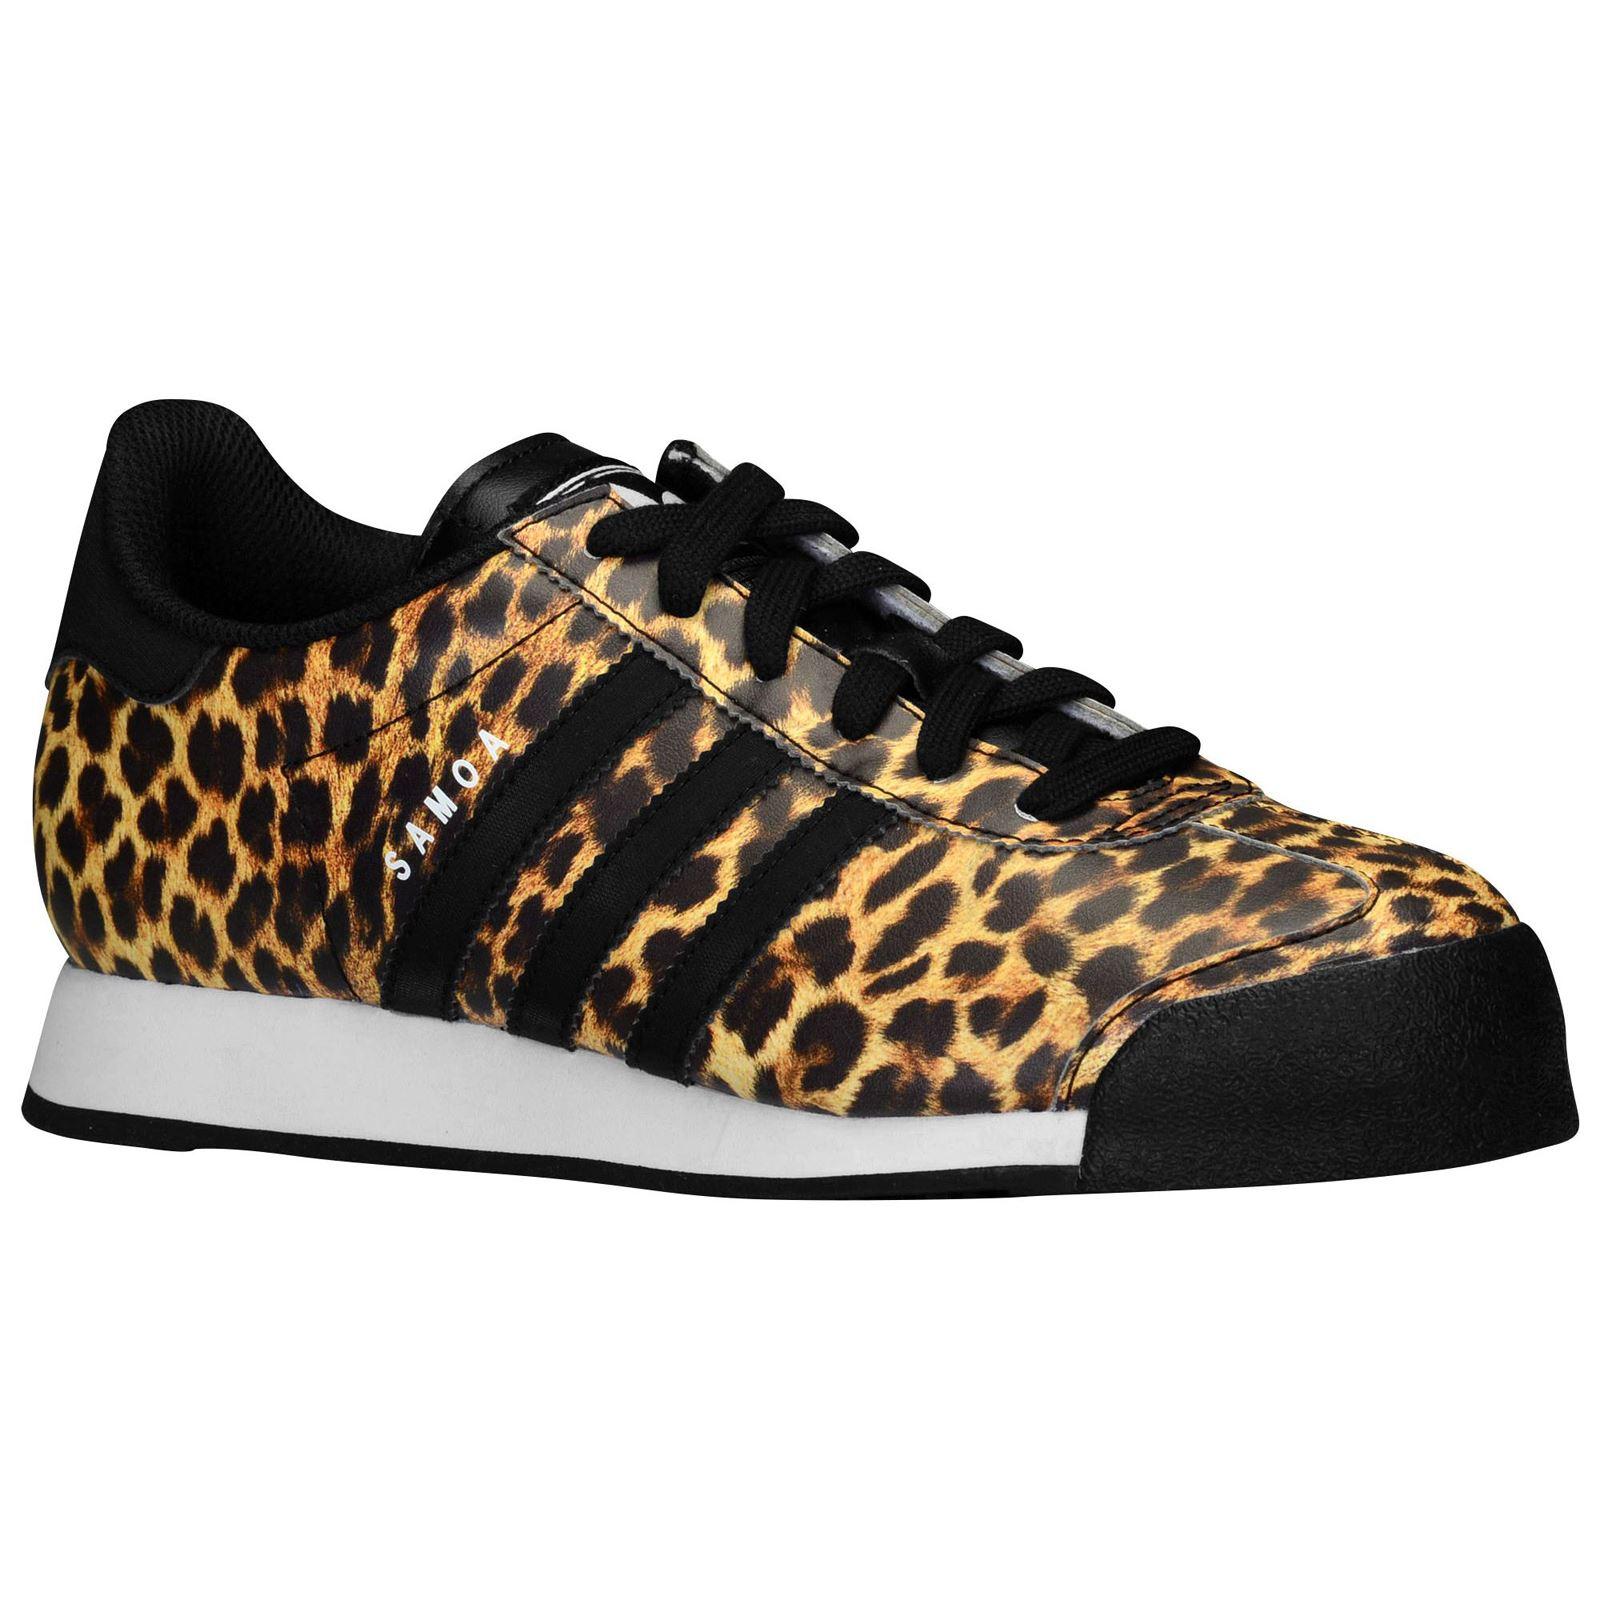 Adidas Original Leopard Shoes